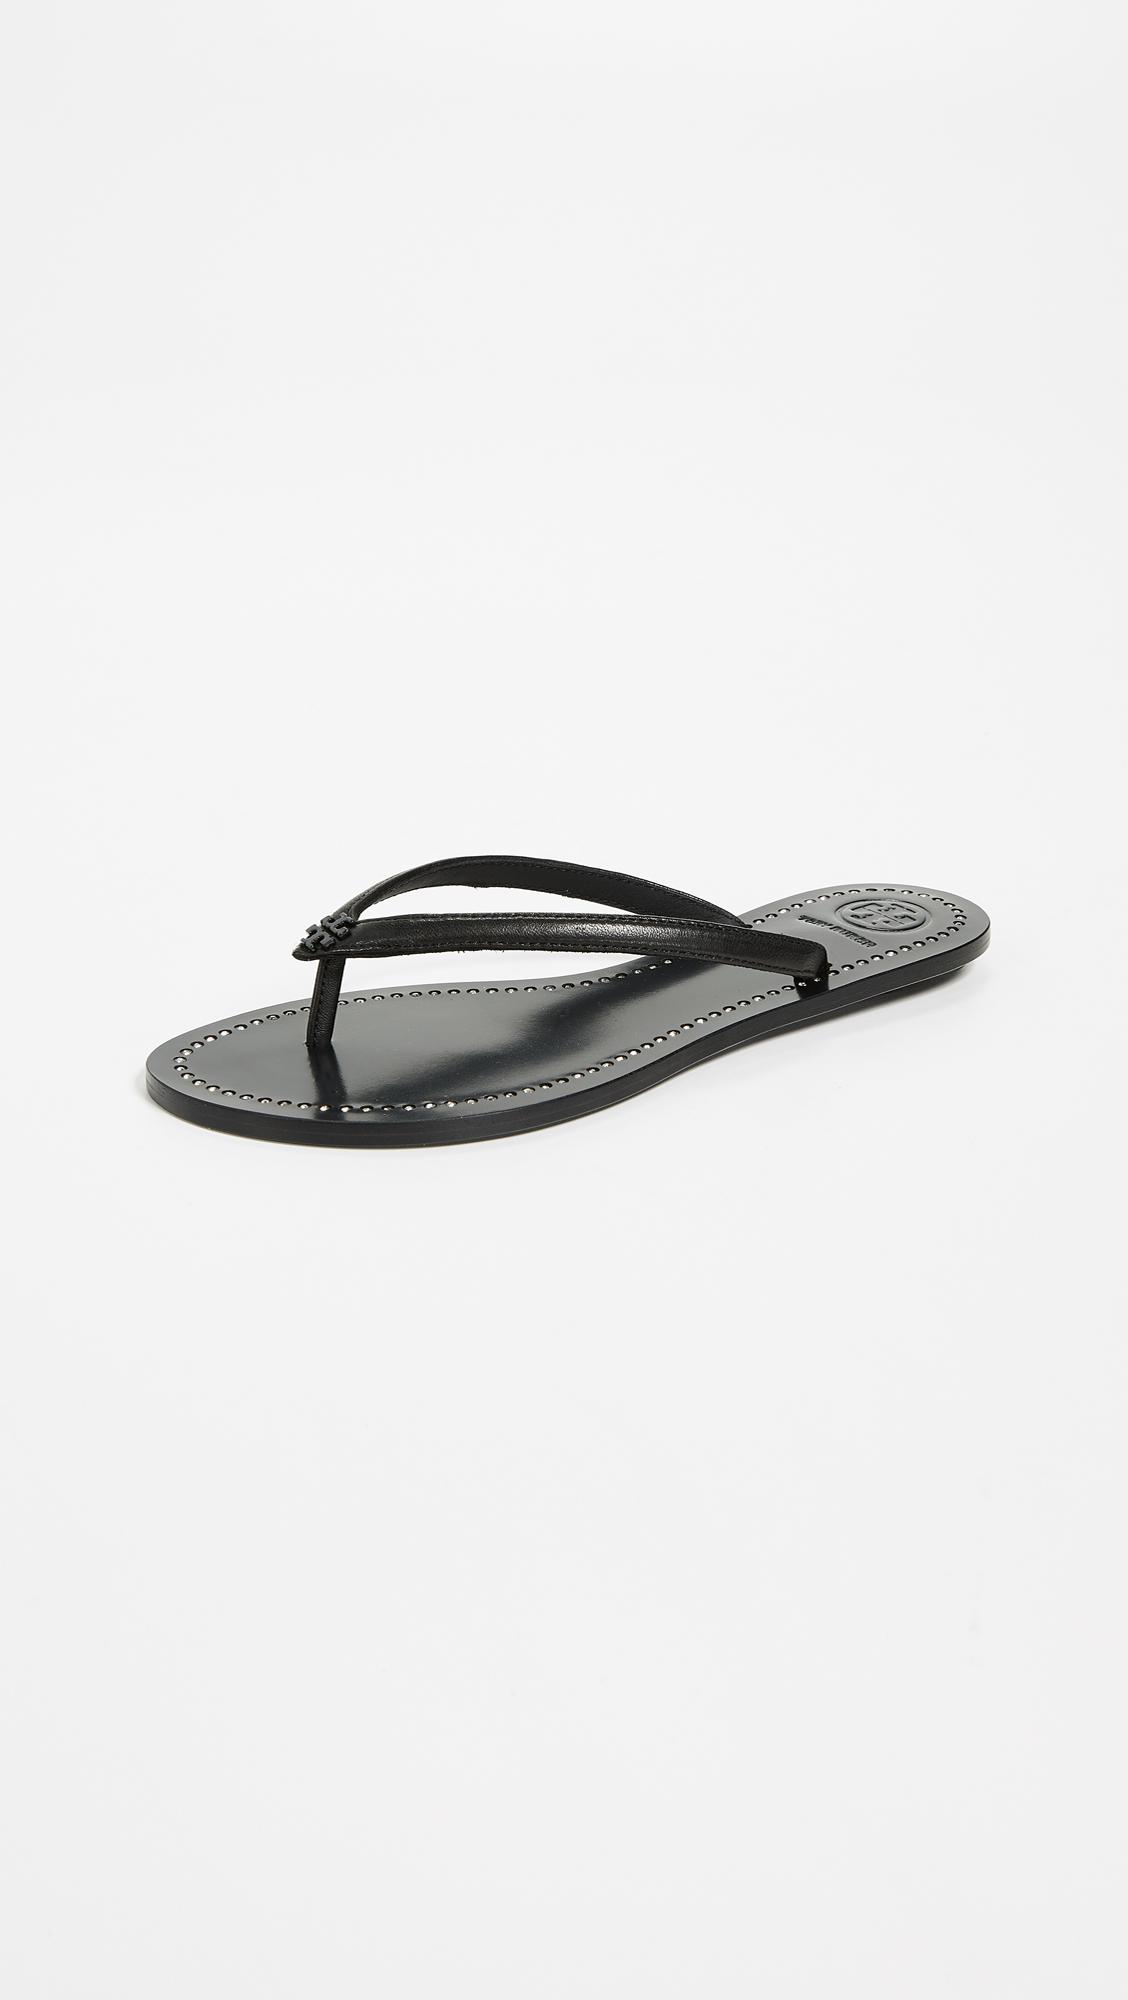 160237a6a91a Lyst - Tory Burch Liana Thong Sandals in Black